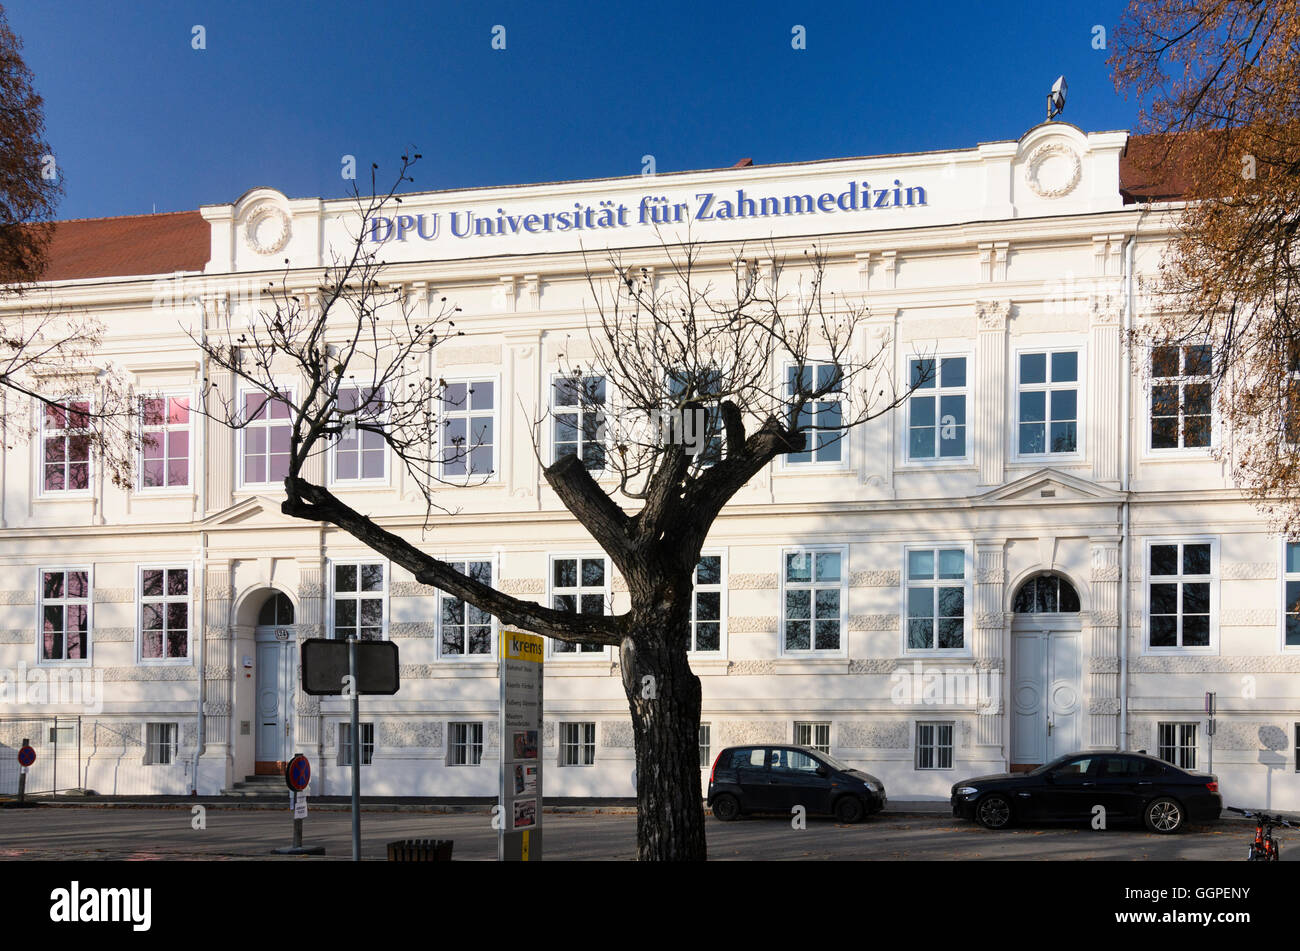 Krems an der Donau: University of Dentistry, Austria, Niederösterreich, Lower Austria, Wachau - Stock Image